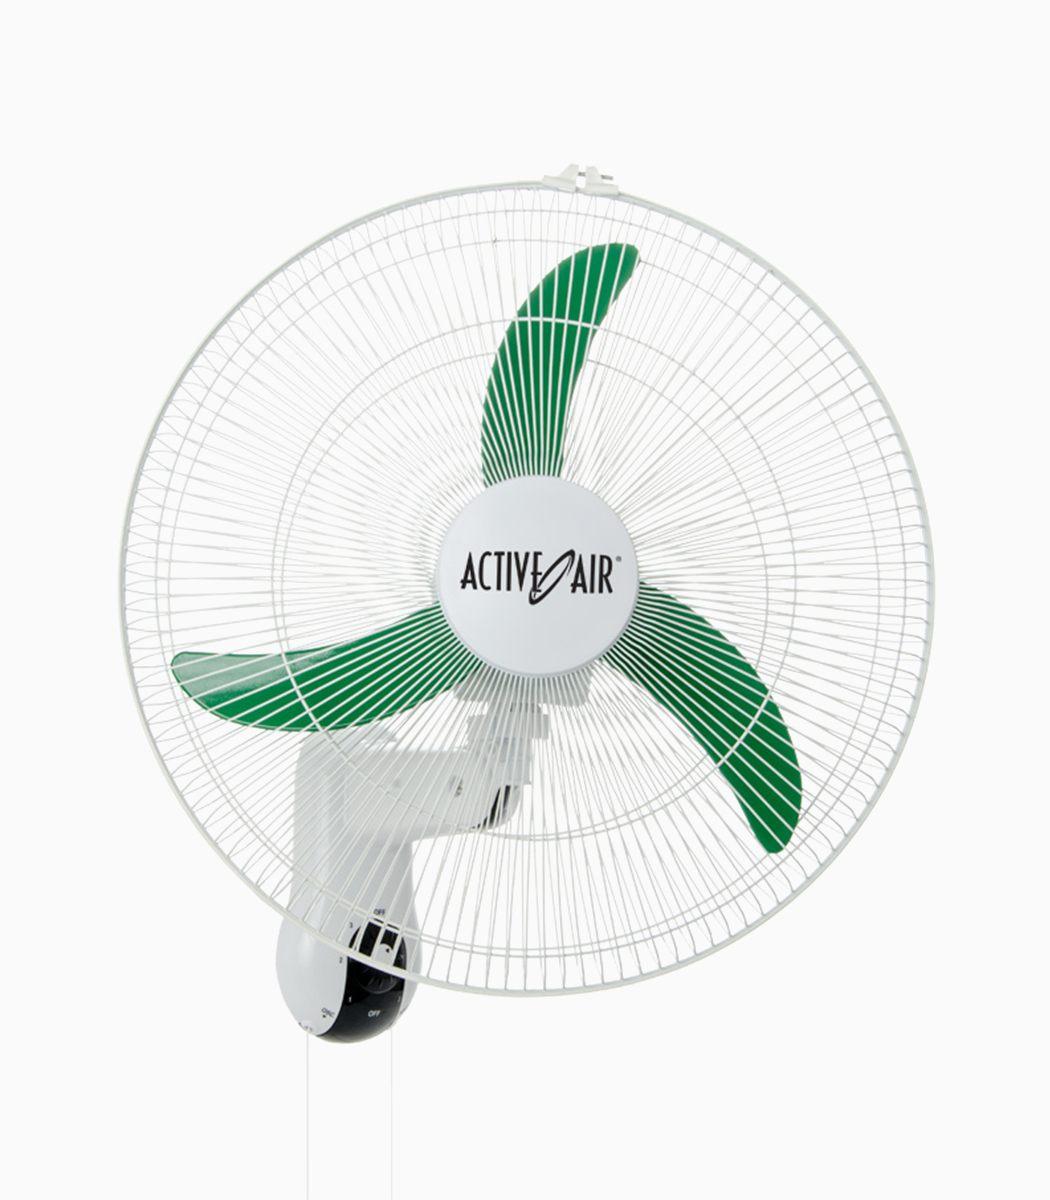 18 Oscillating Wall Fans : Active air quot oscillating wall mount fan greenlightsdirect